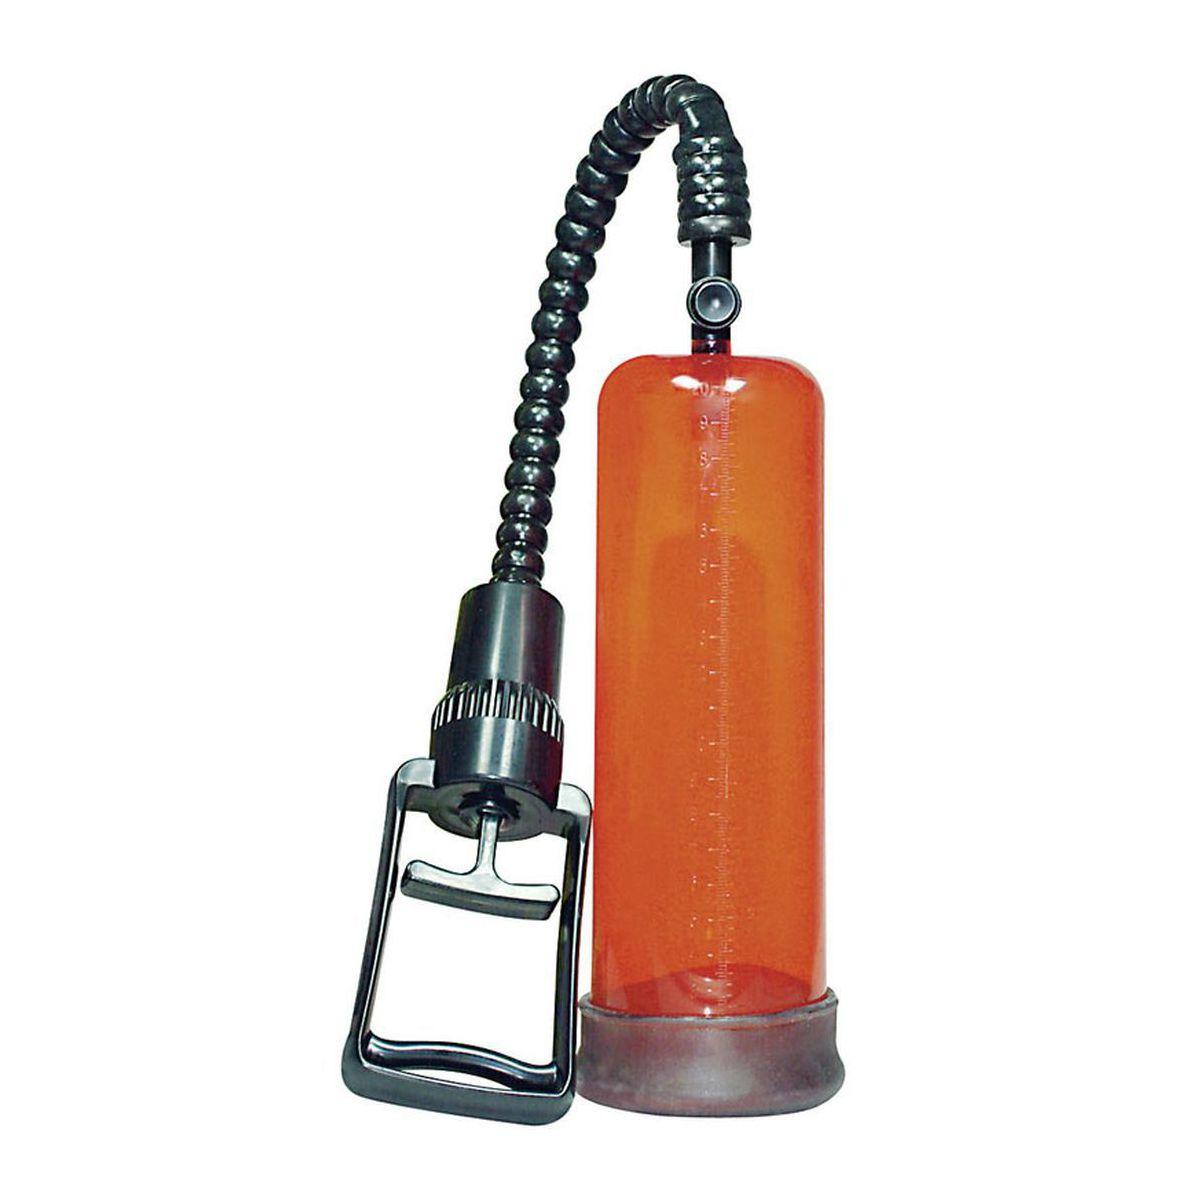 2.25 cilindro de bomba de pene